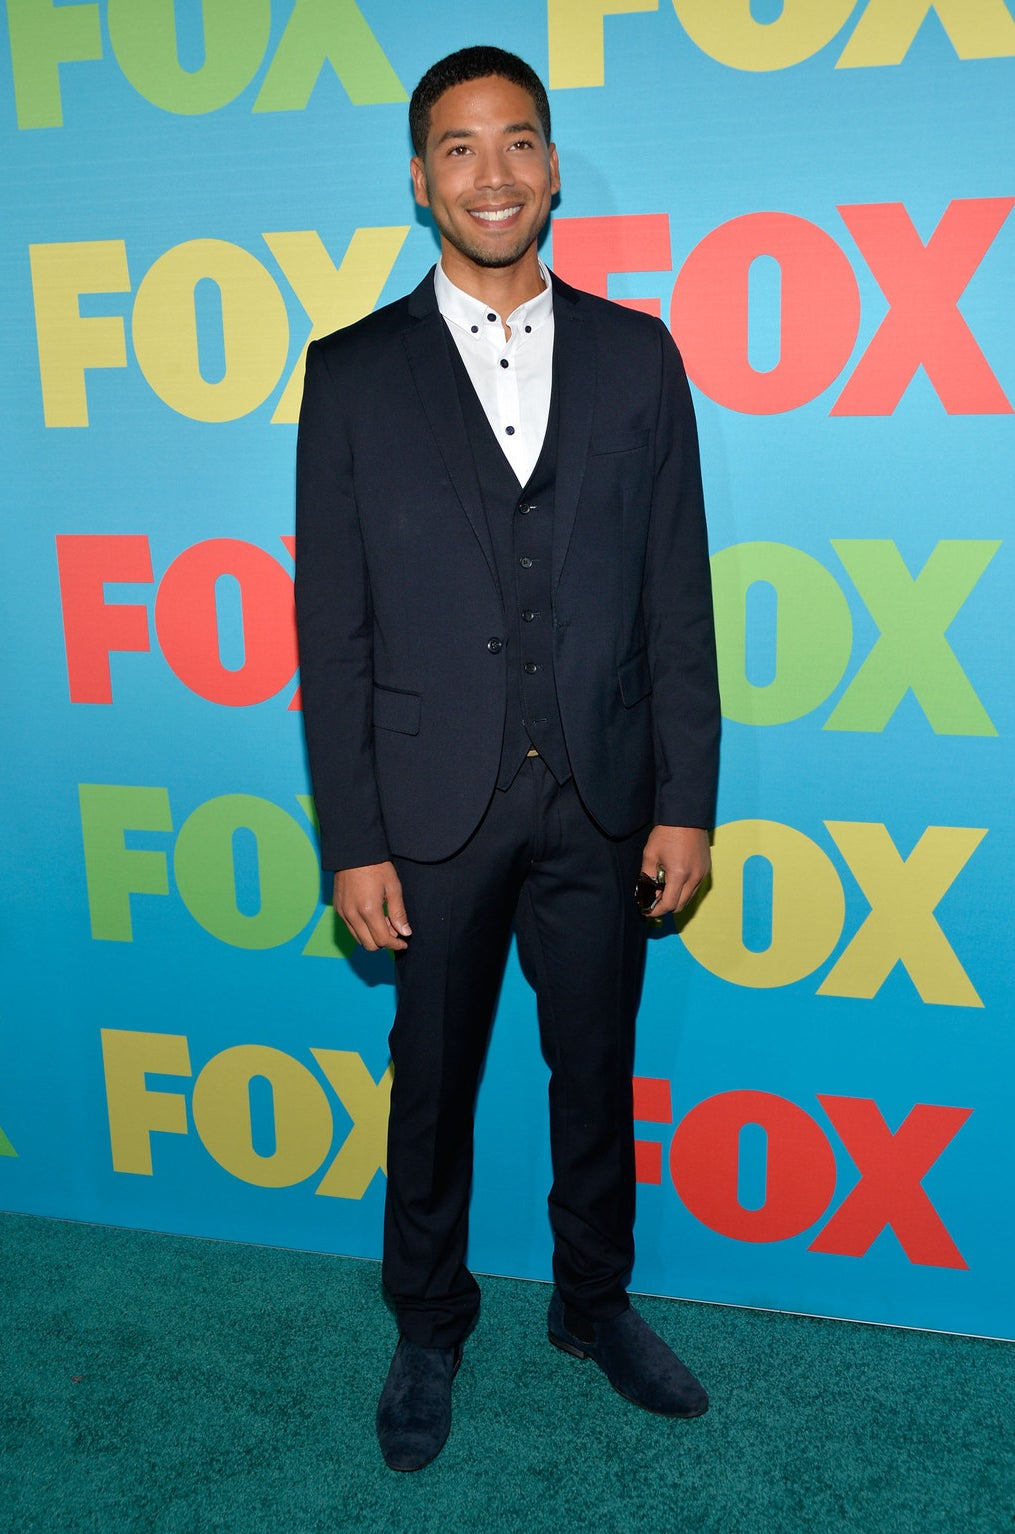 Jussie Smollett from Fox's new drama Empire